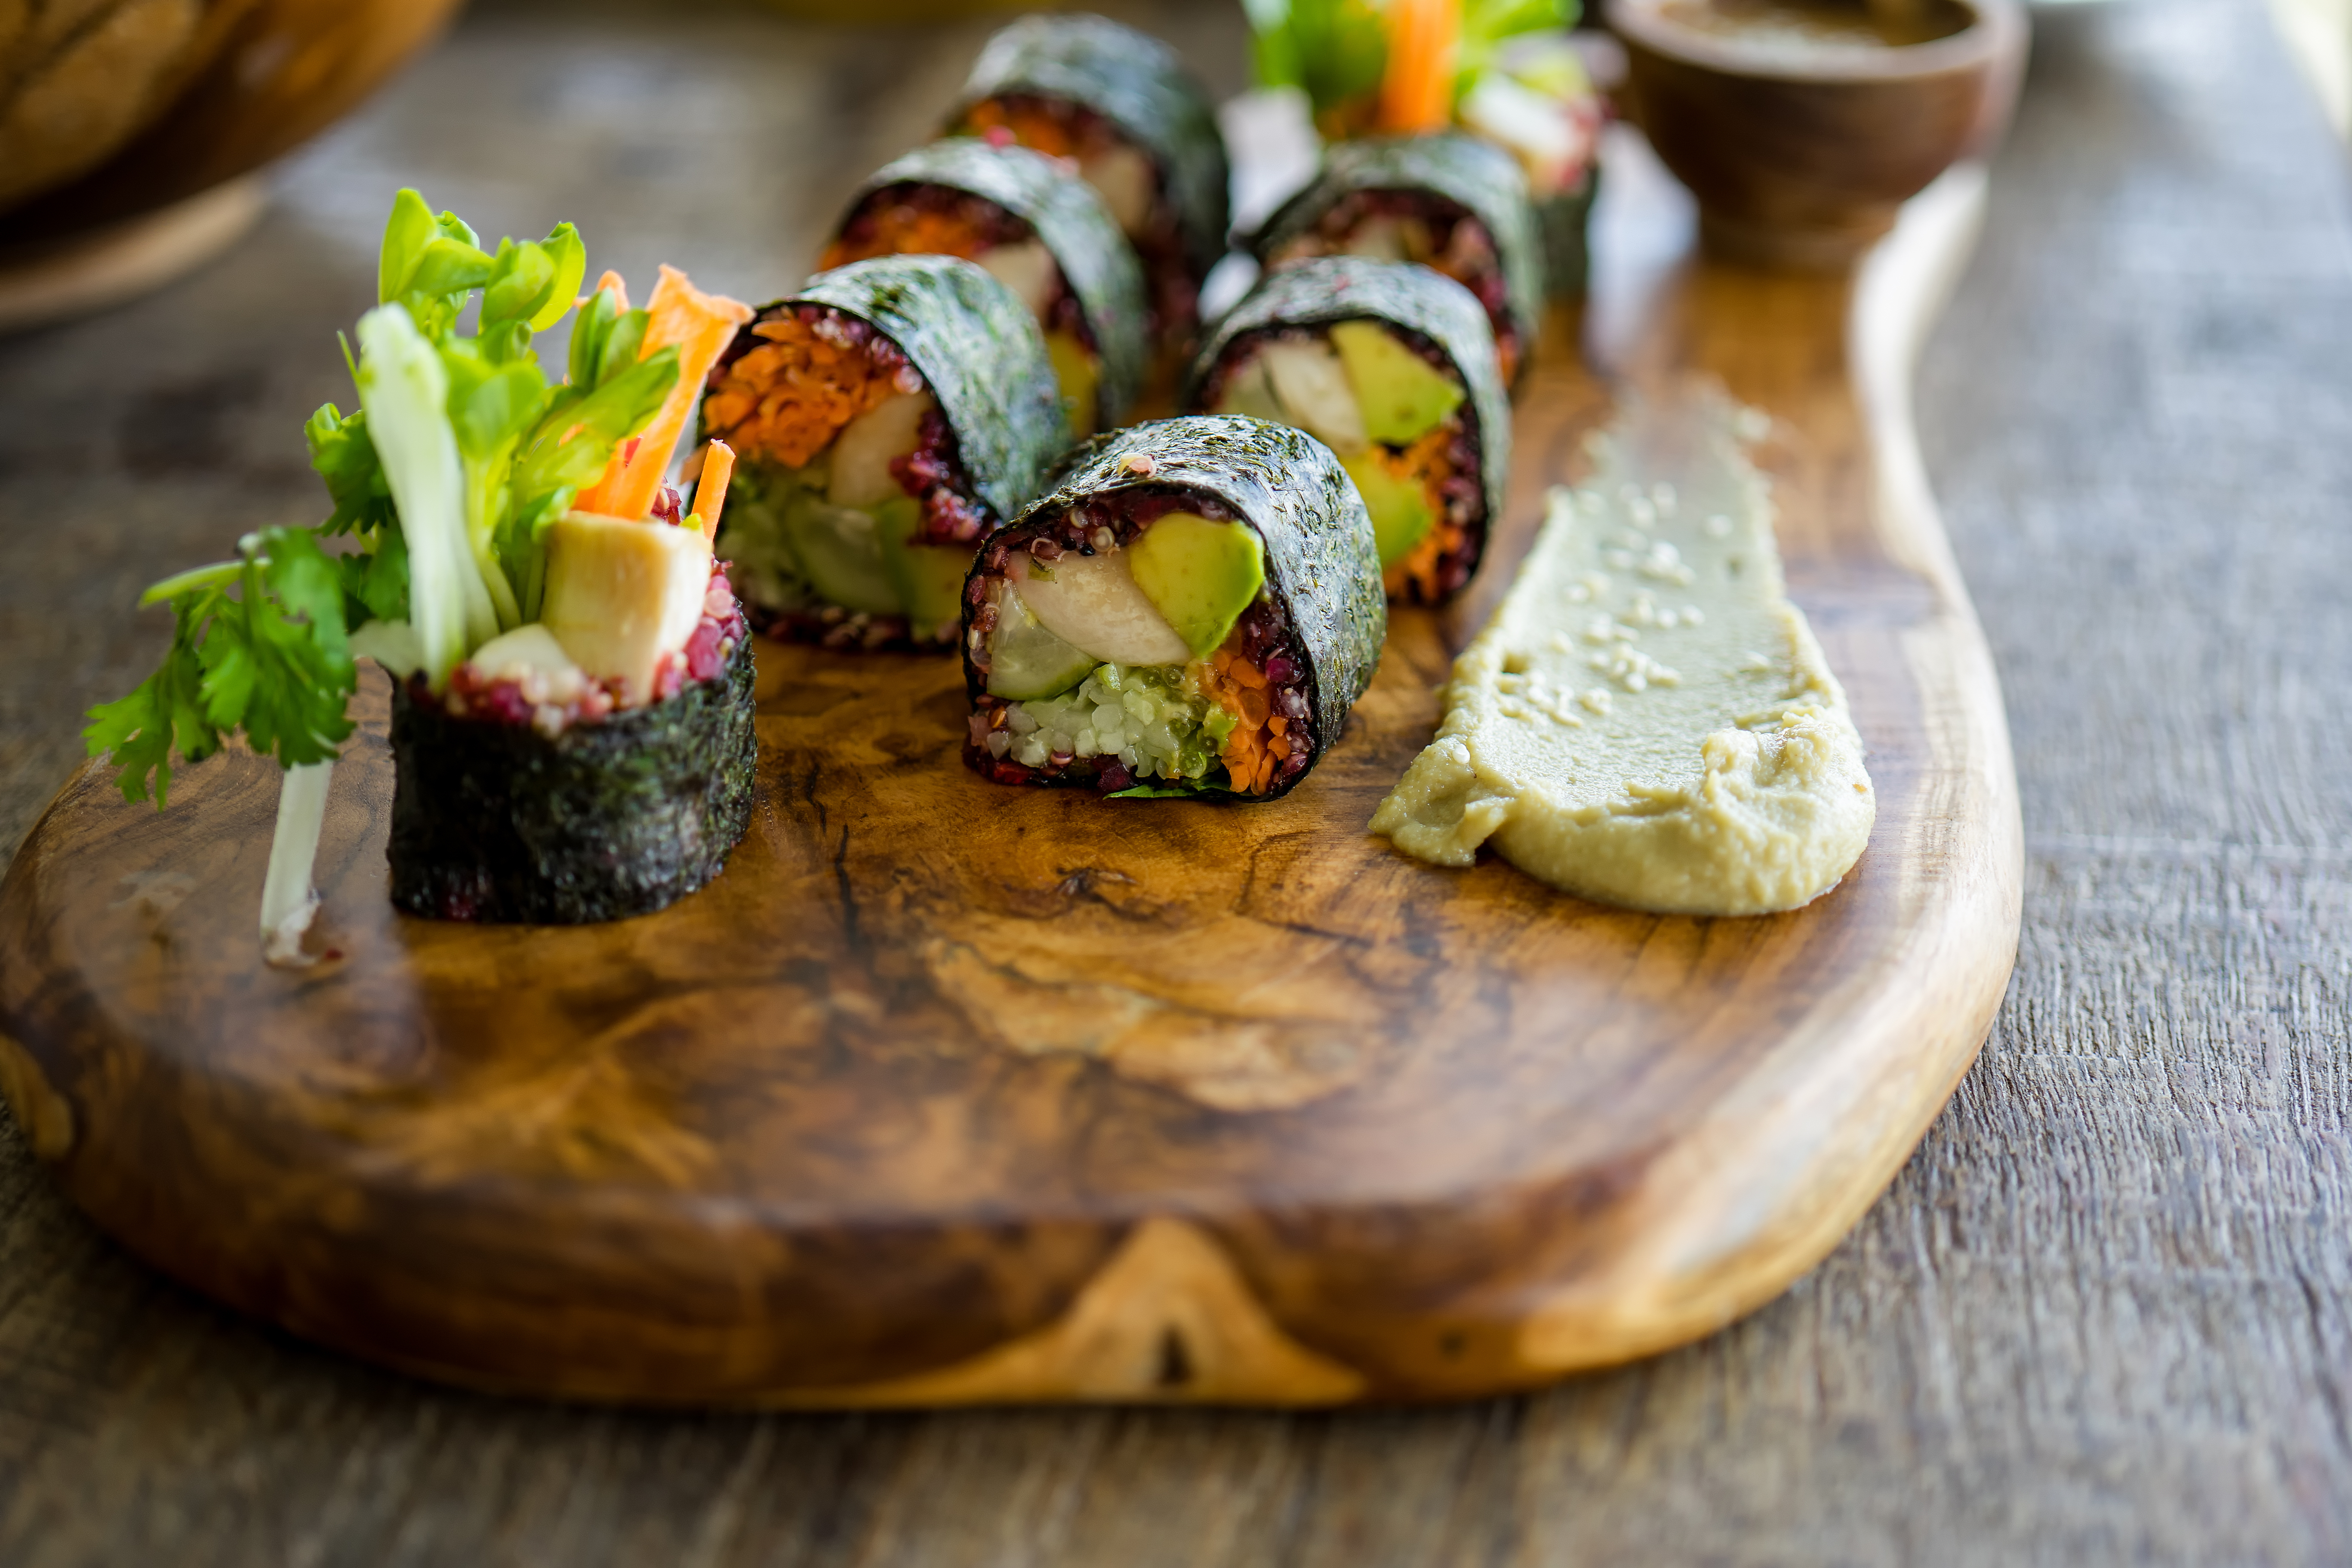 Raw vegan nori hand rolls with pink hors